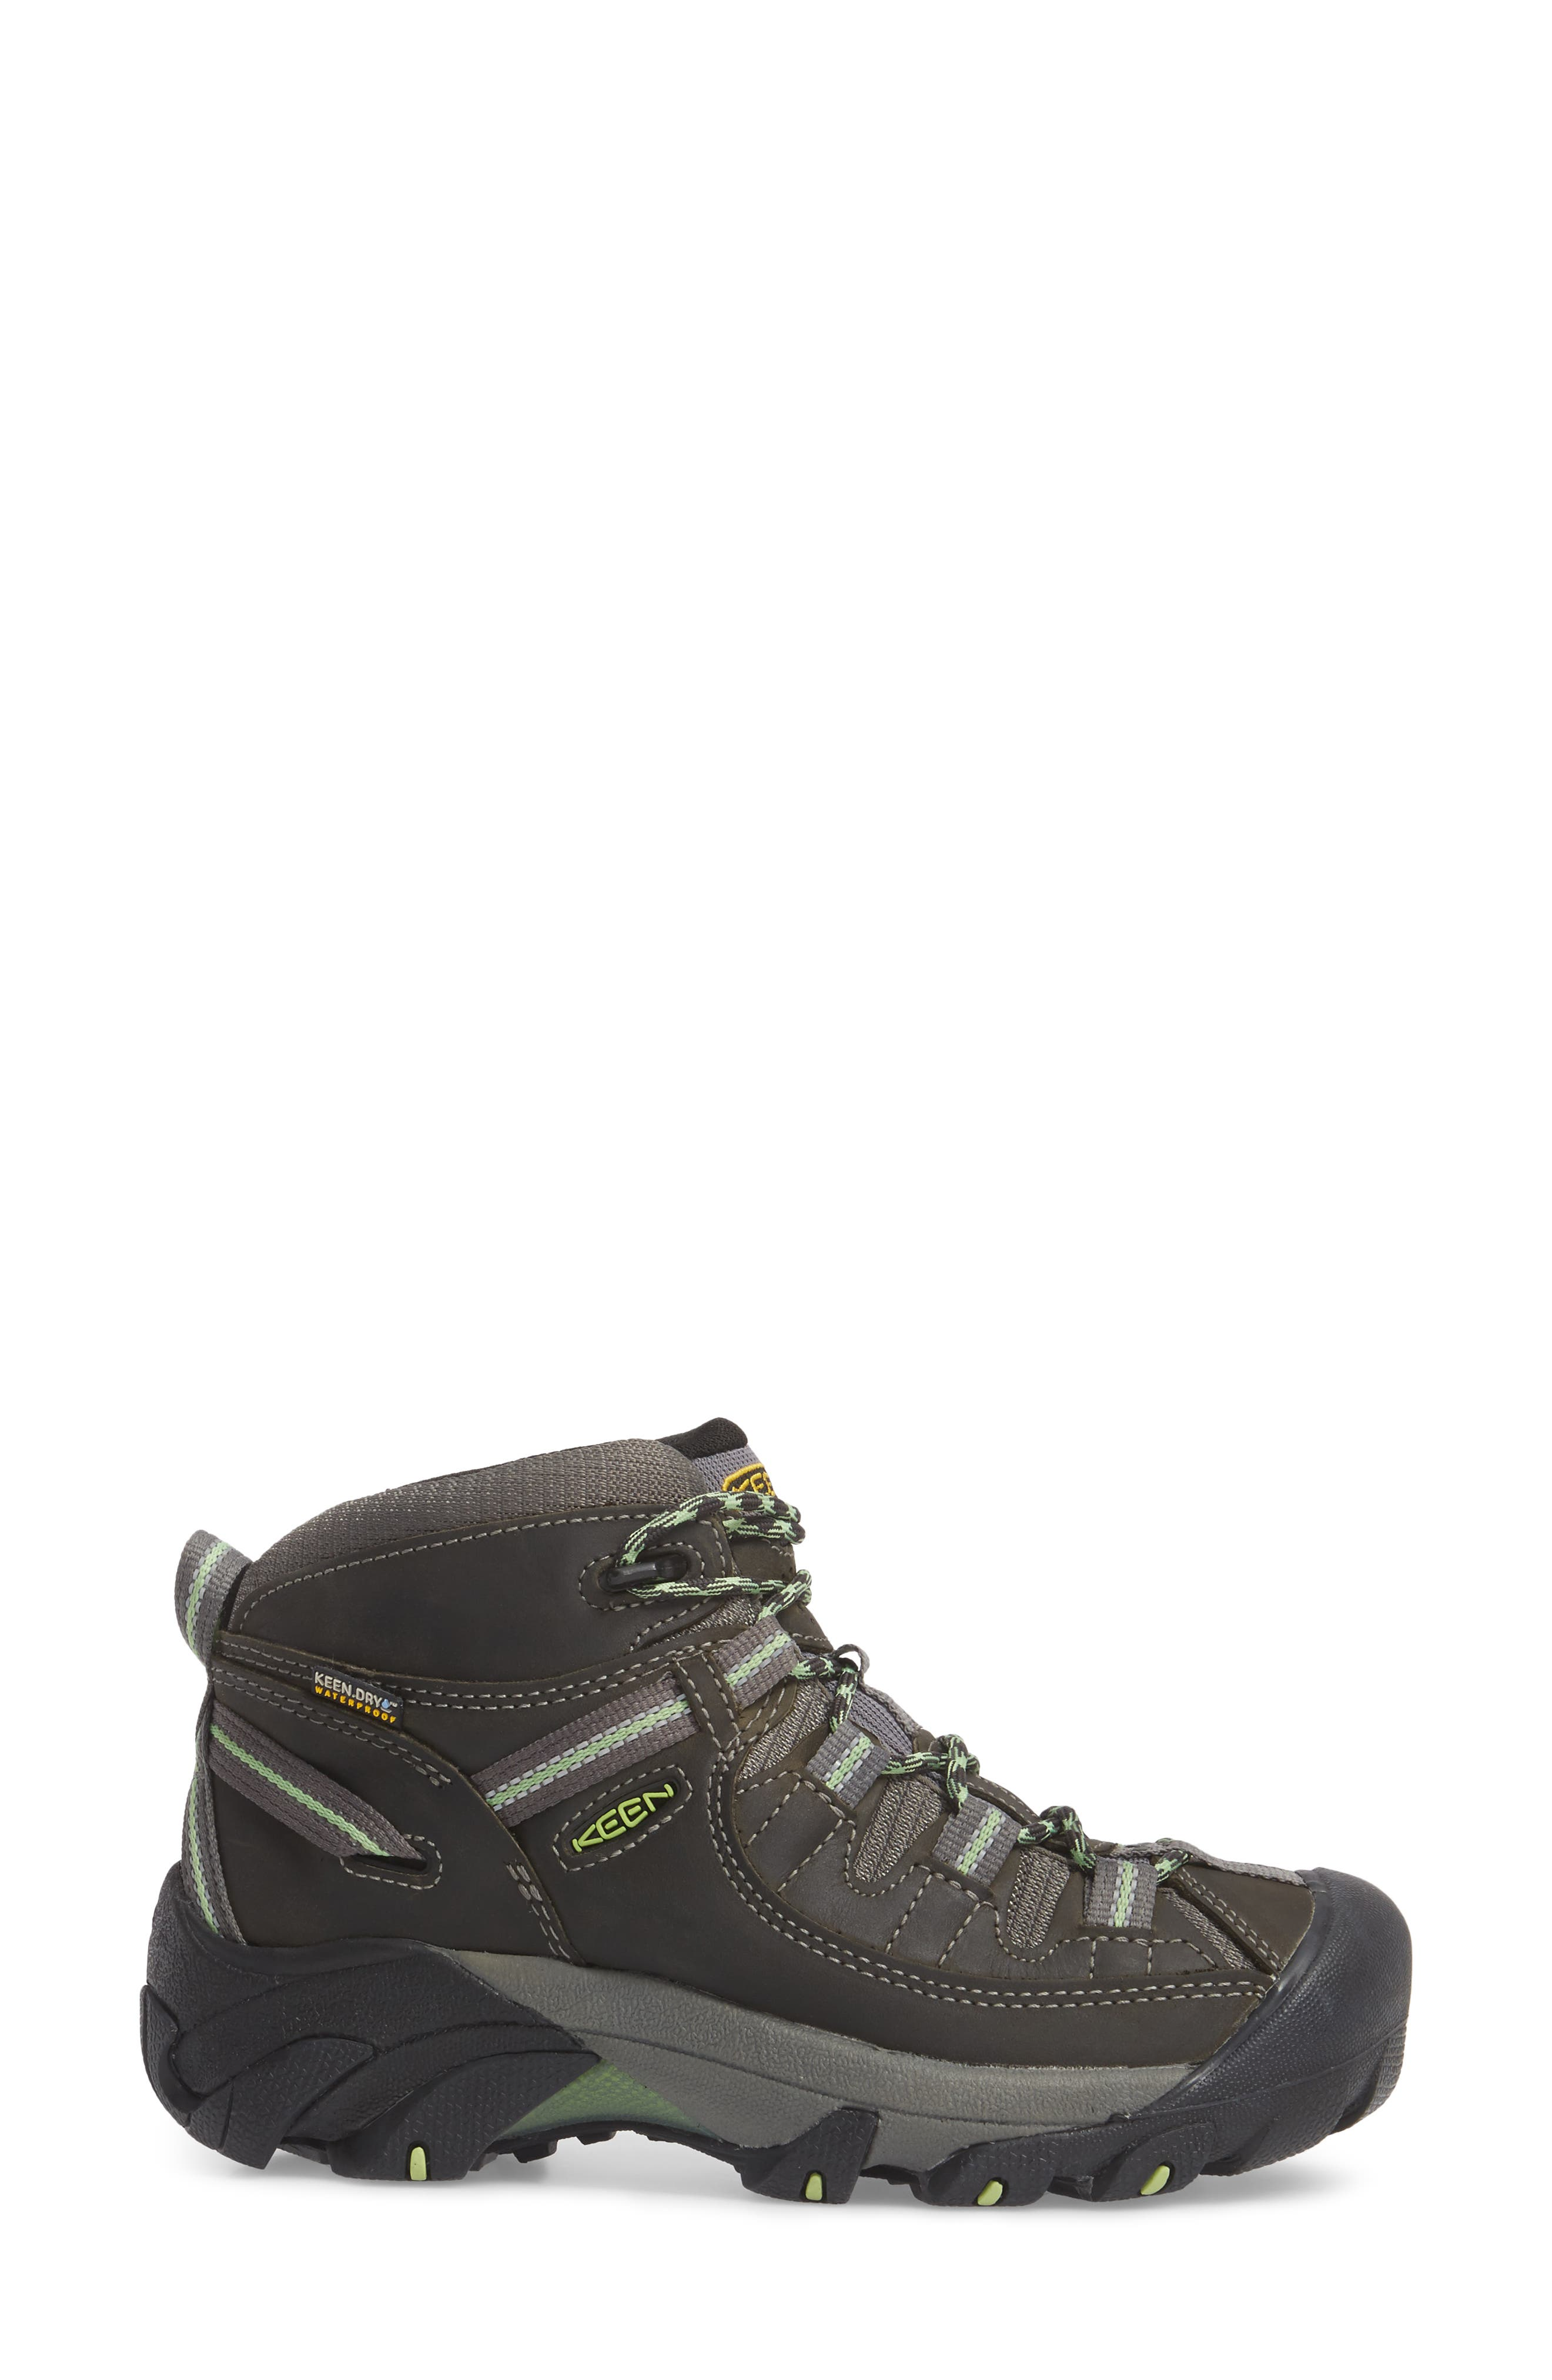 KEEN, Targhee II Mid Waterproof Hiking Boot, Alternate thumbnail 3, color, RAVEN/ OPALINE